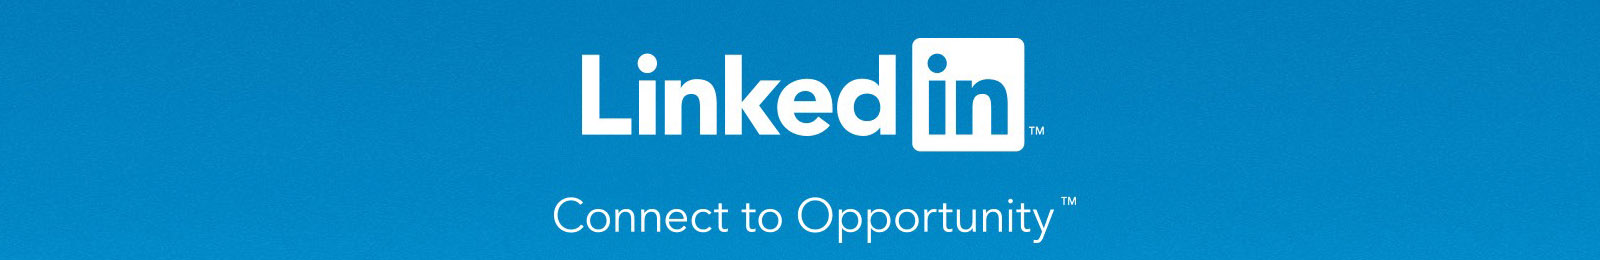 Linkedin marketing course training institute proideators